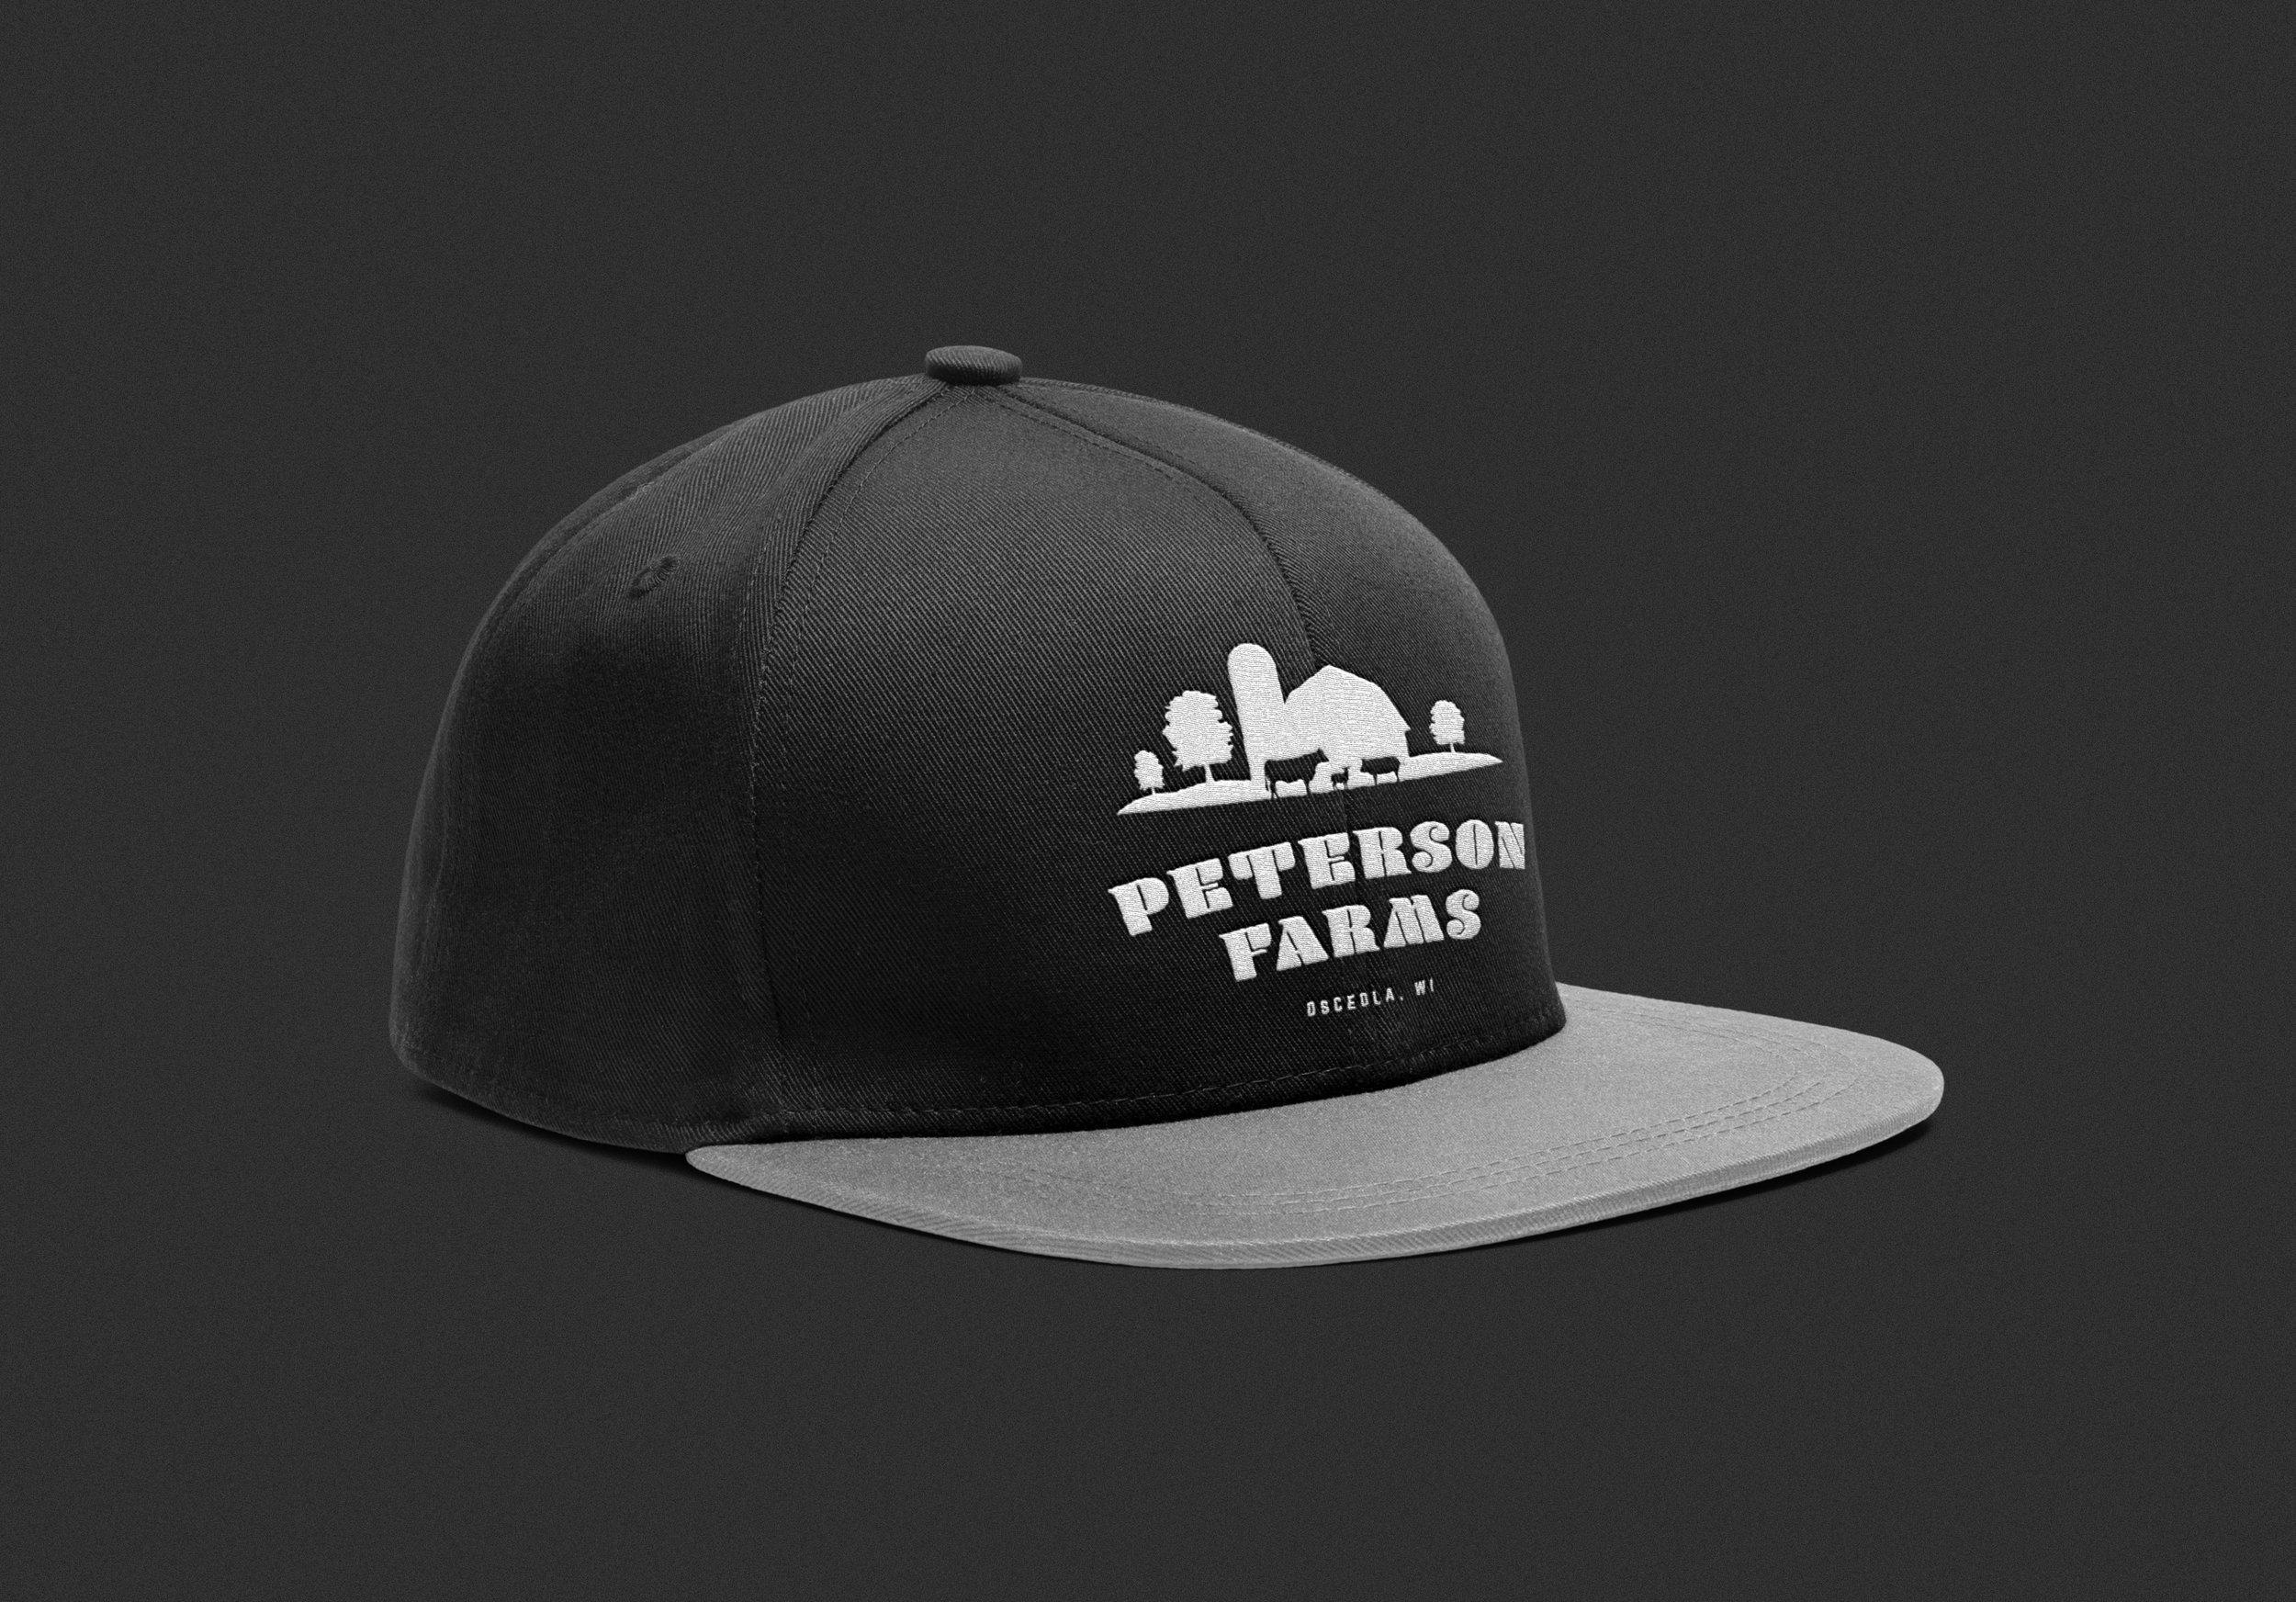 pcm_hat1.jpg